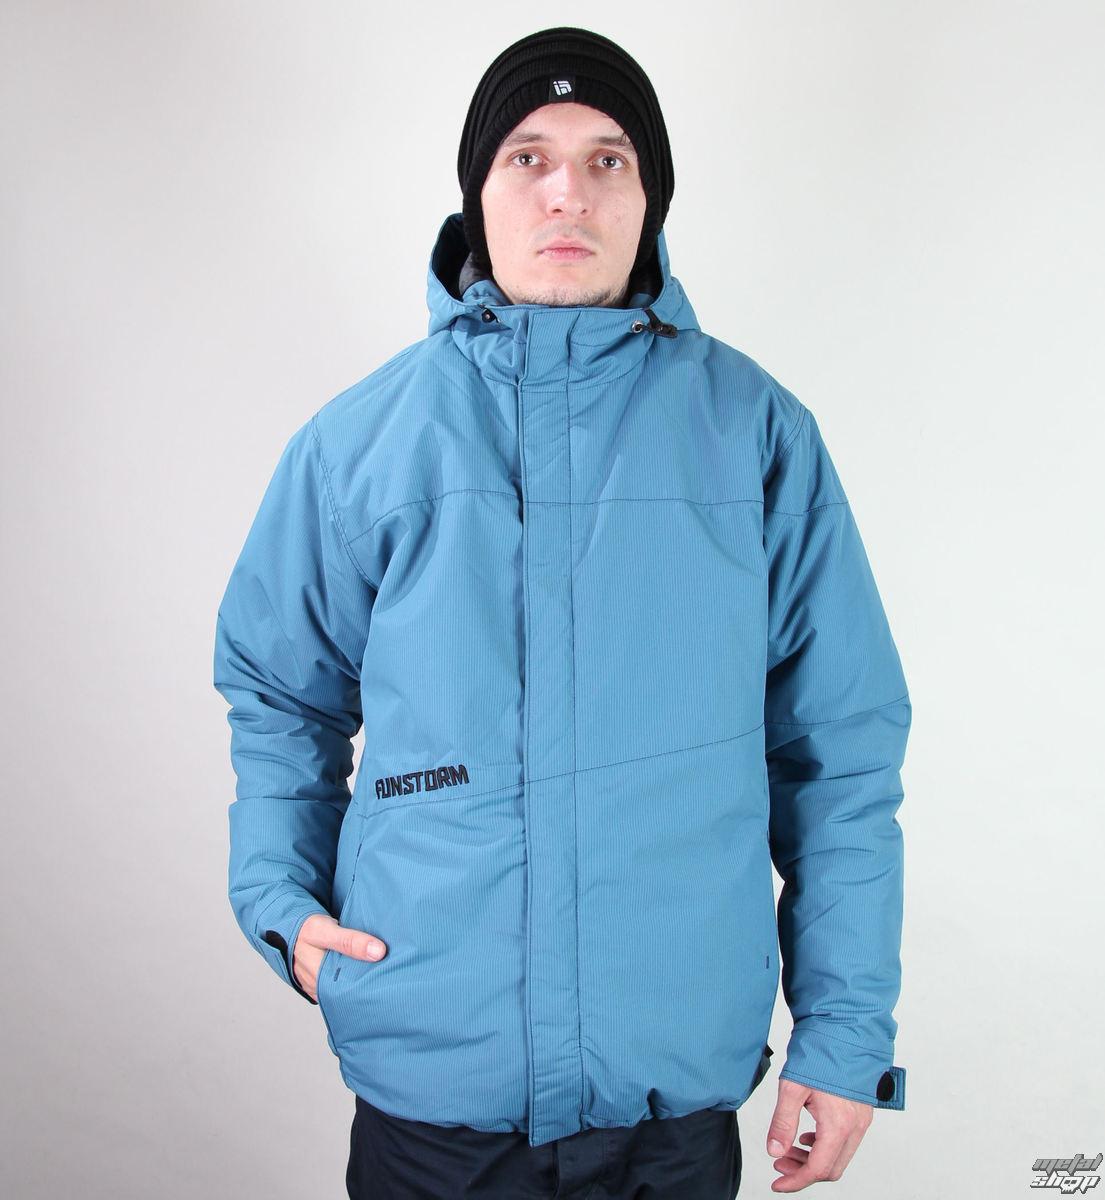 bunda pánska zimný -snb- FUNSTORM - Folum - 15 NAVY